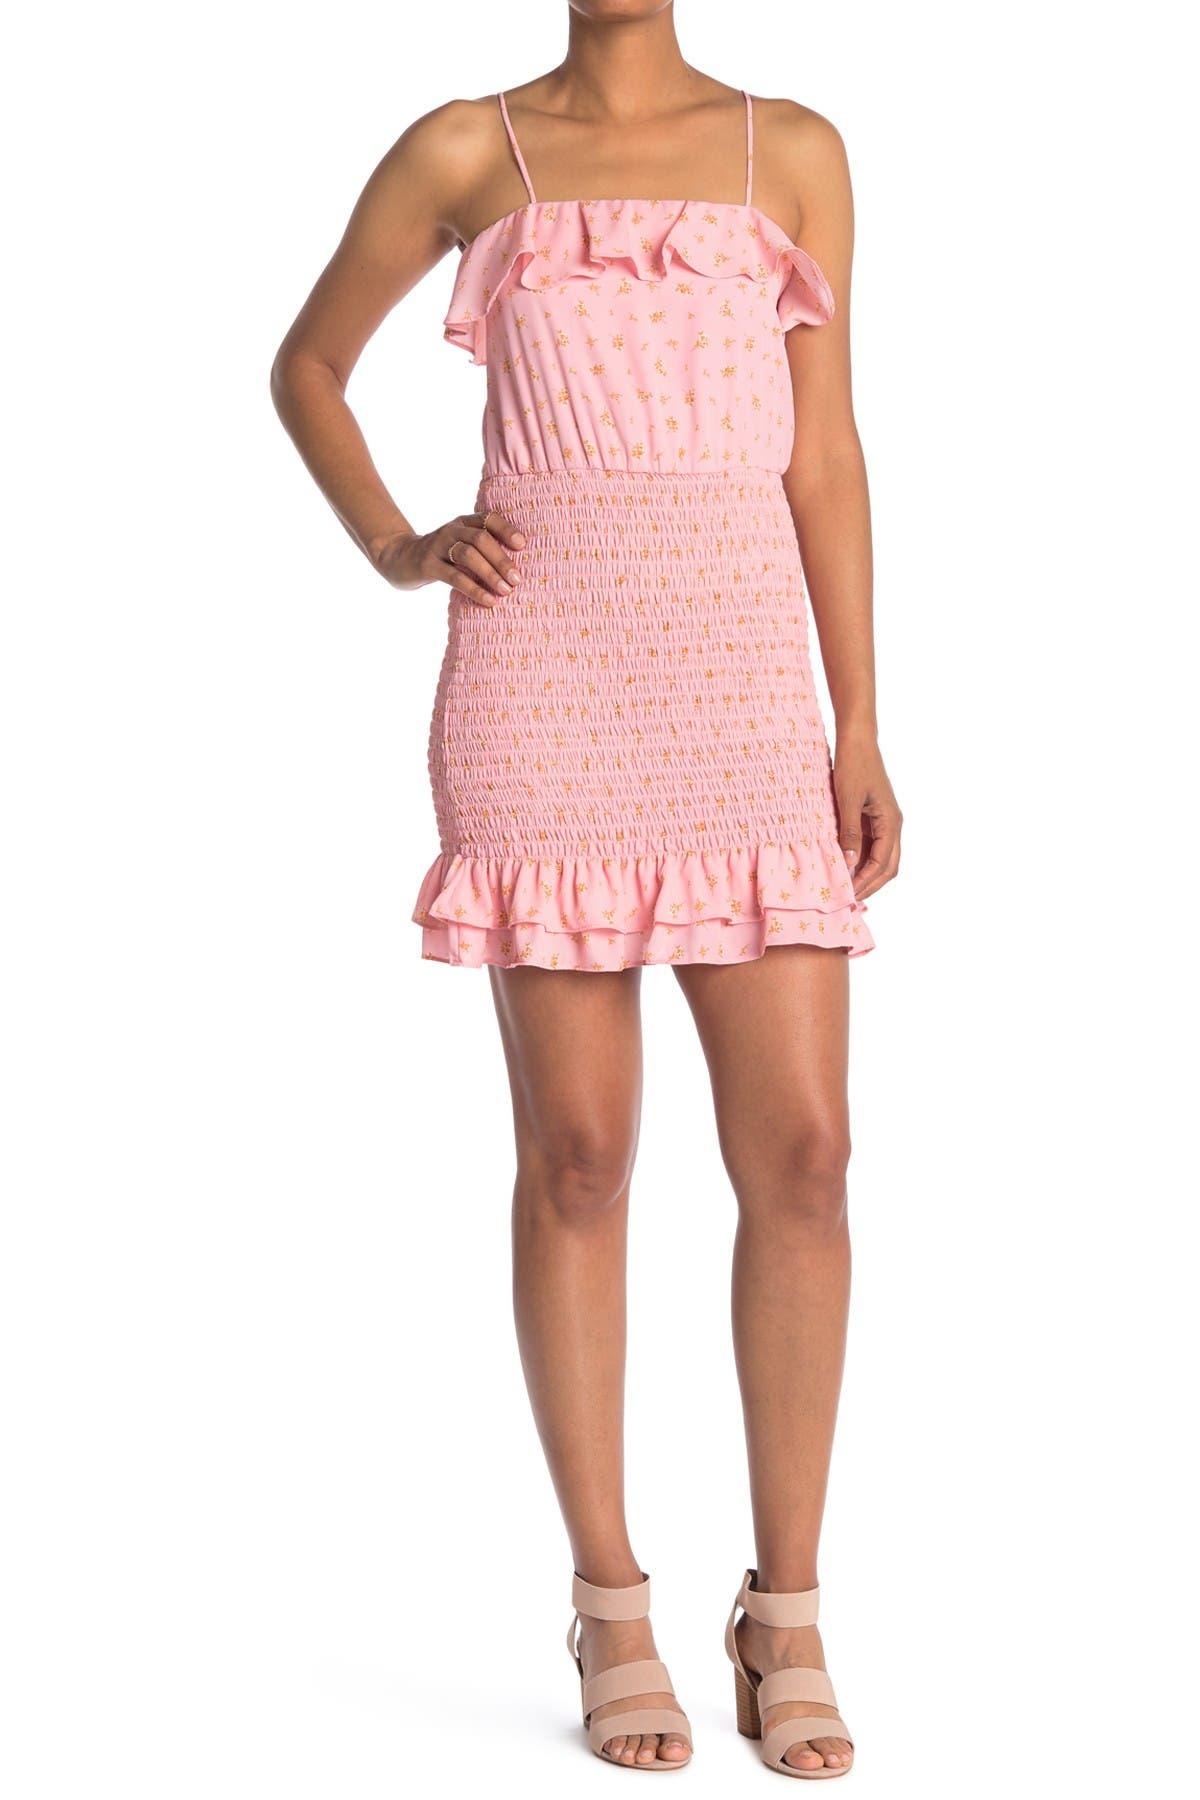 Image of ROW A Spaghetti Strap Printed Ruffle Smocked Mini Dress